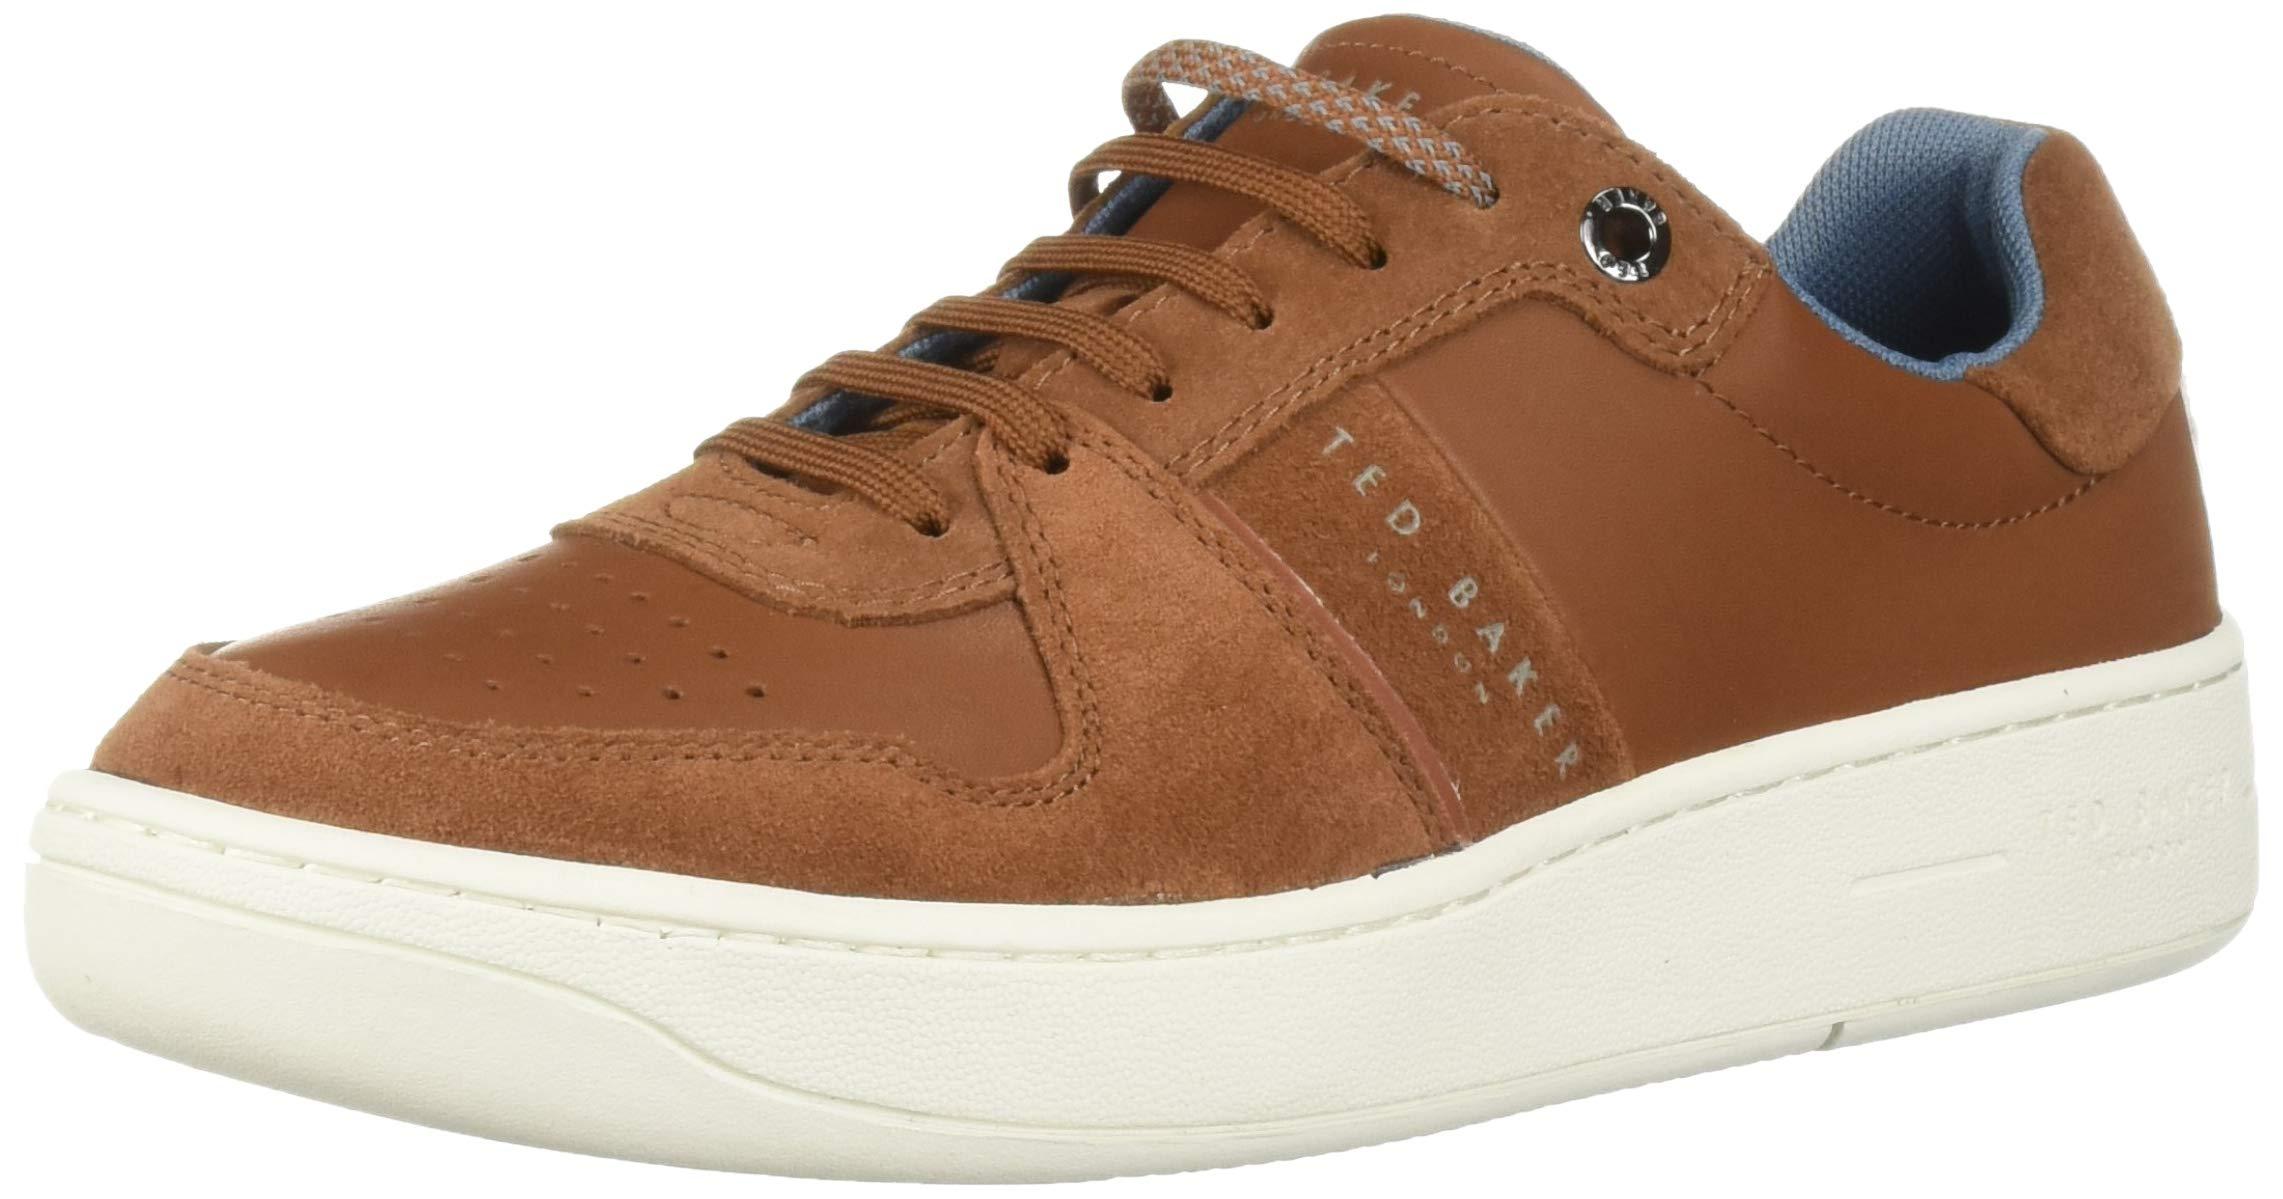 Ted Baker Men's Maloni Sneaker Tan 10 Regular US